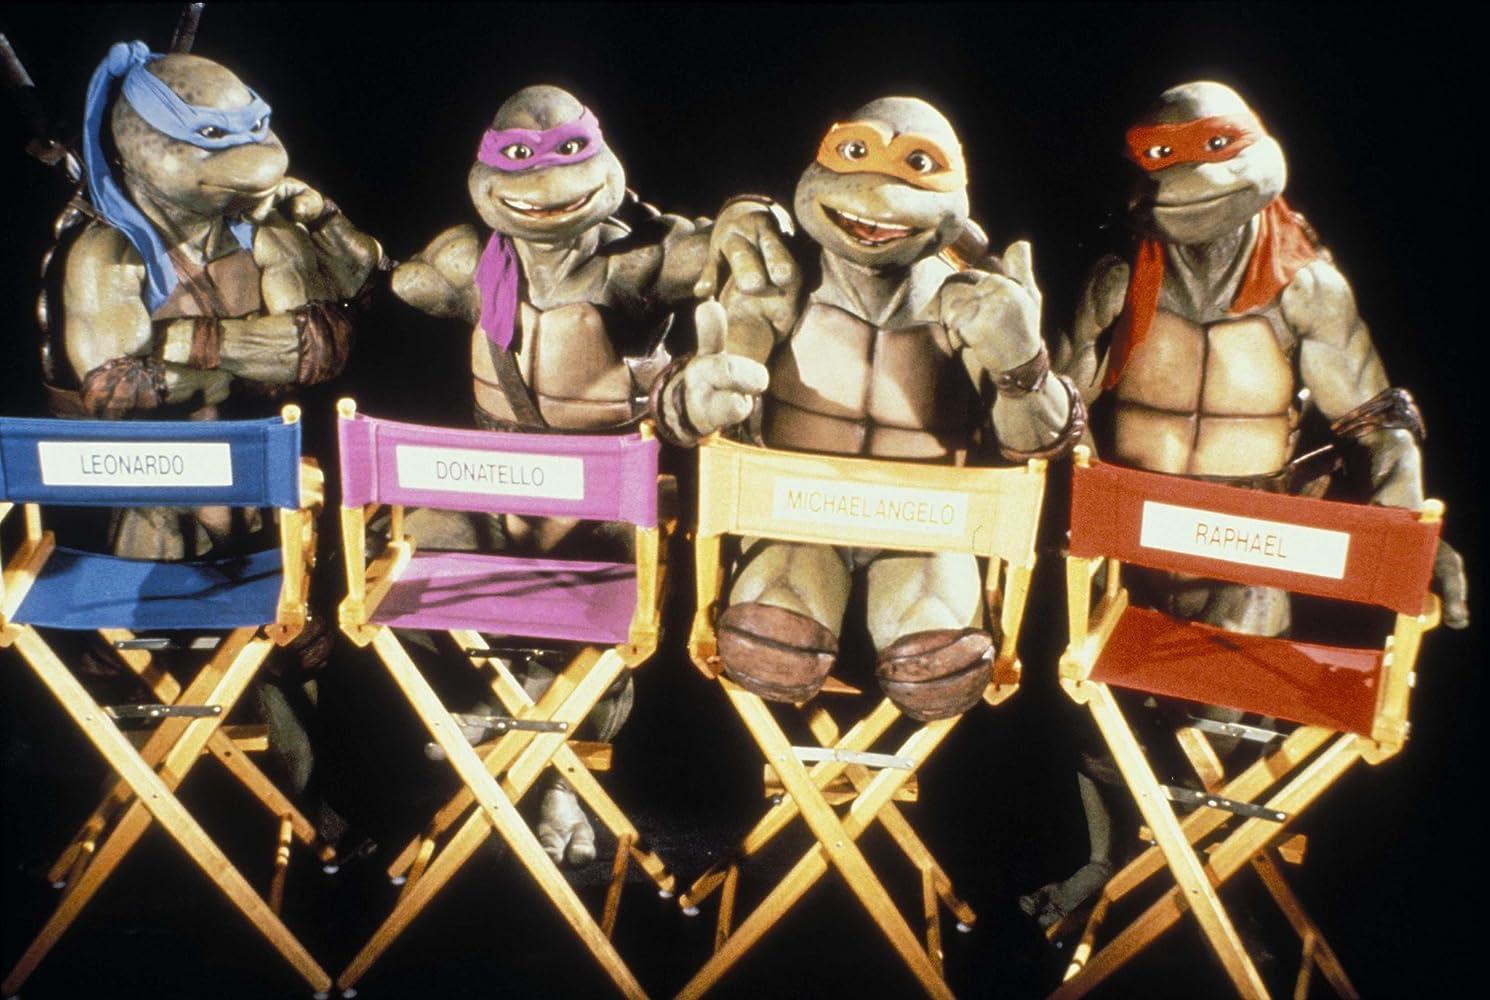 Retro review teenage mutant ninja turtles ii secret of the ooze - Retro Review Teenage Mutant Ninja Turtles Ii Secret Of The Ooze 24